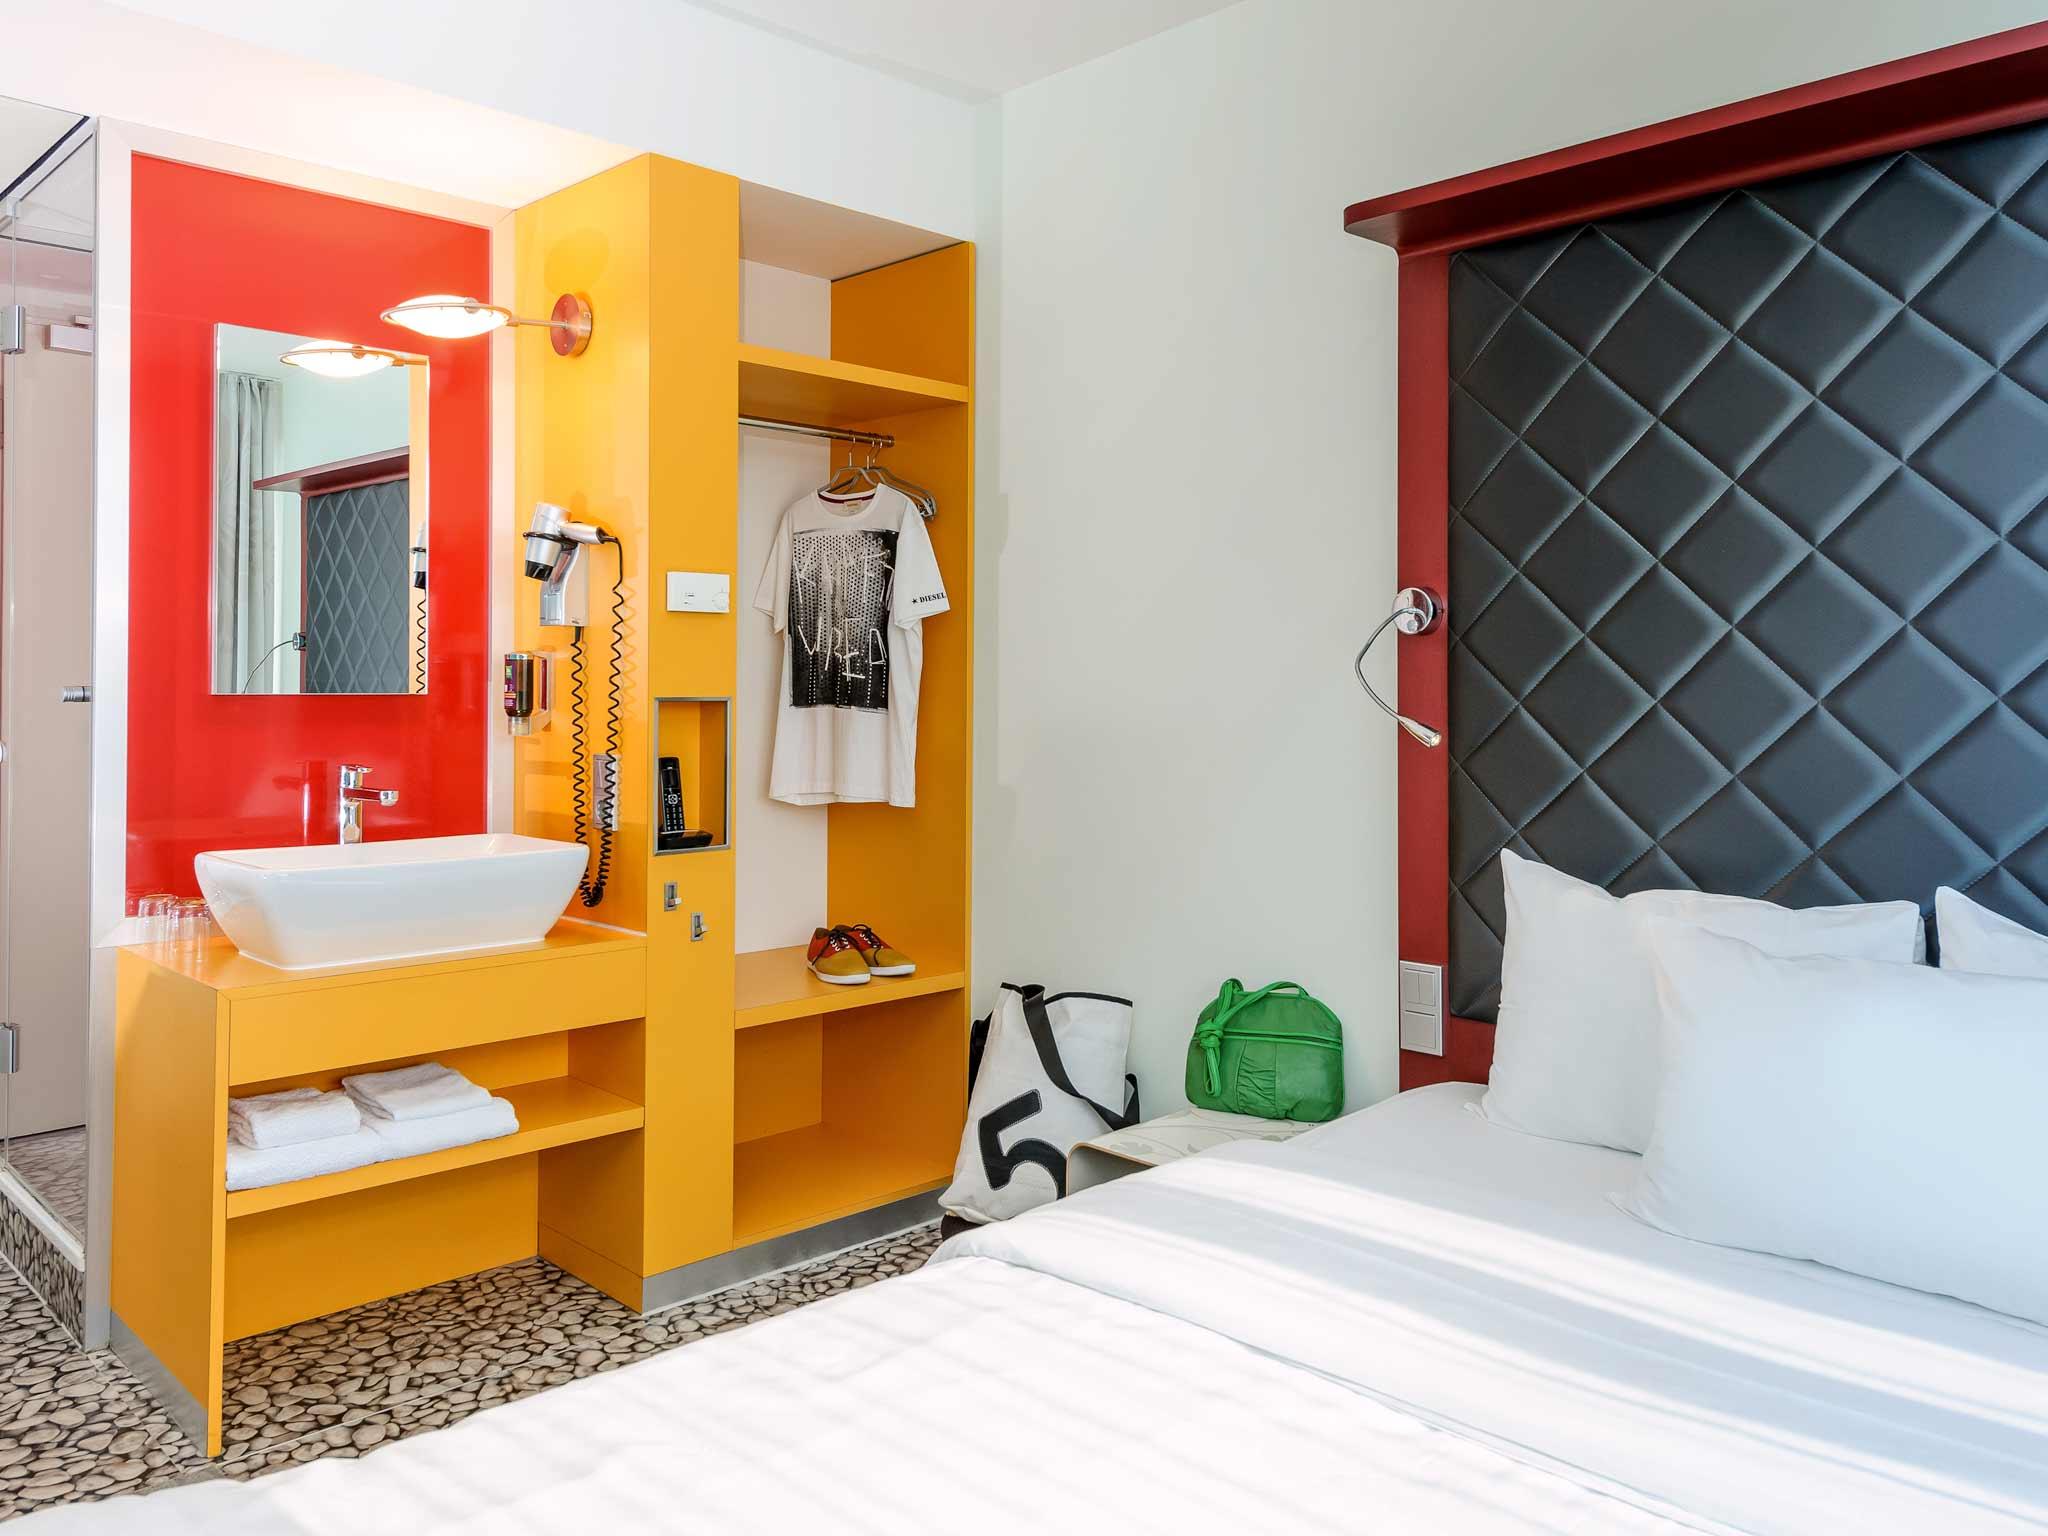 ibis Styles Hotel Berlin Mitte Widok pokoju